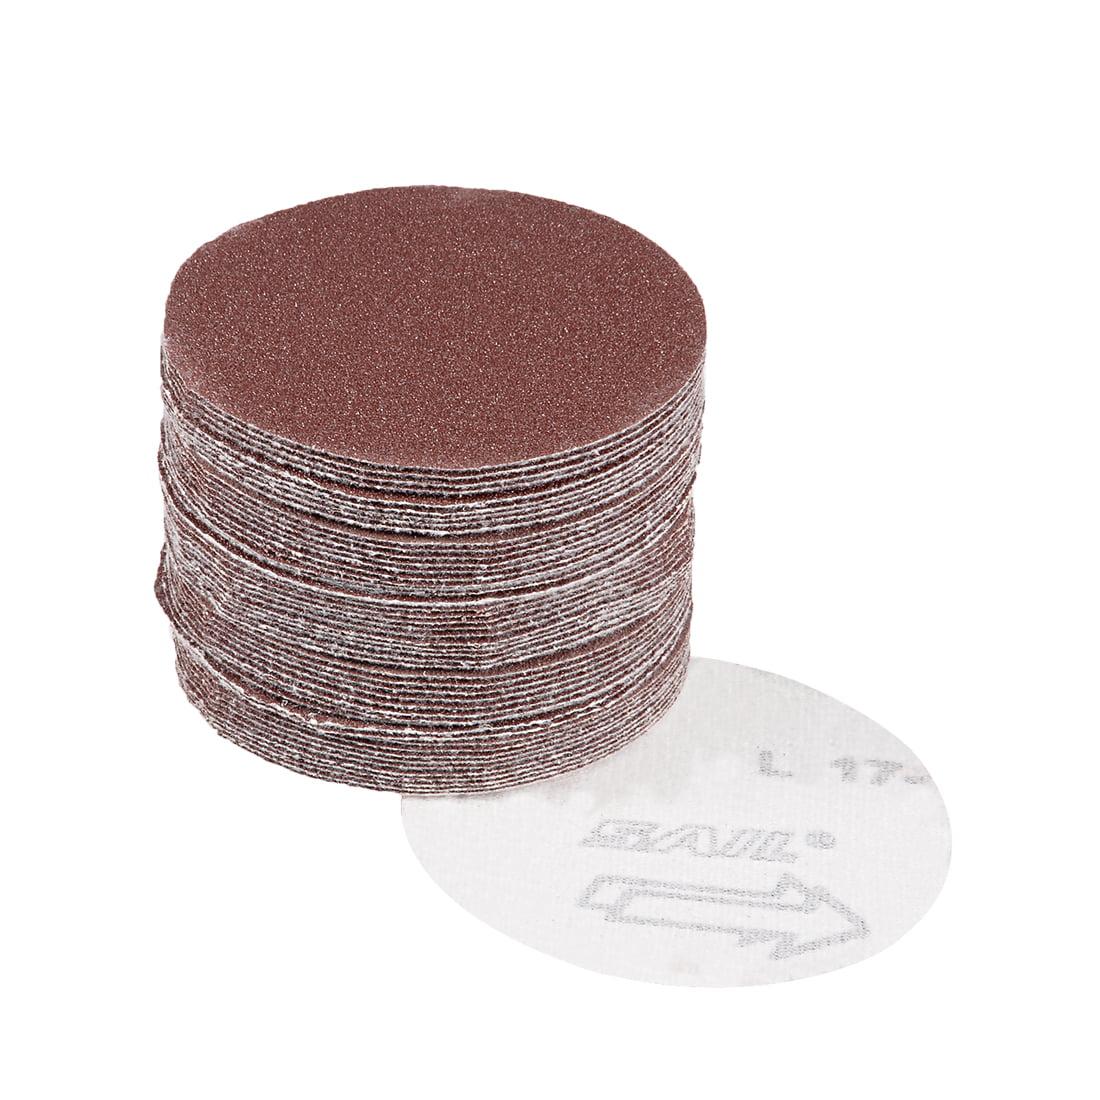 ARC ABRASIVES 30479T PSA Sanding Disc,AlO,Cloth,8in,100 Grit